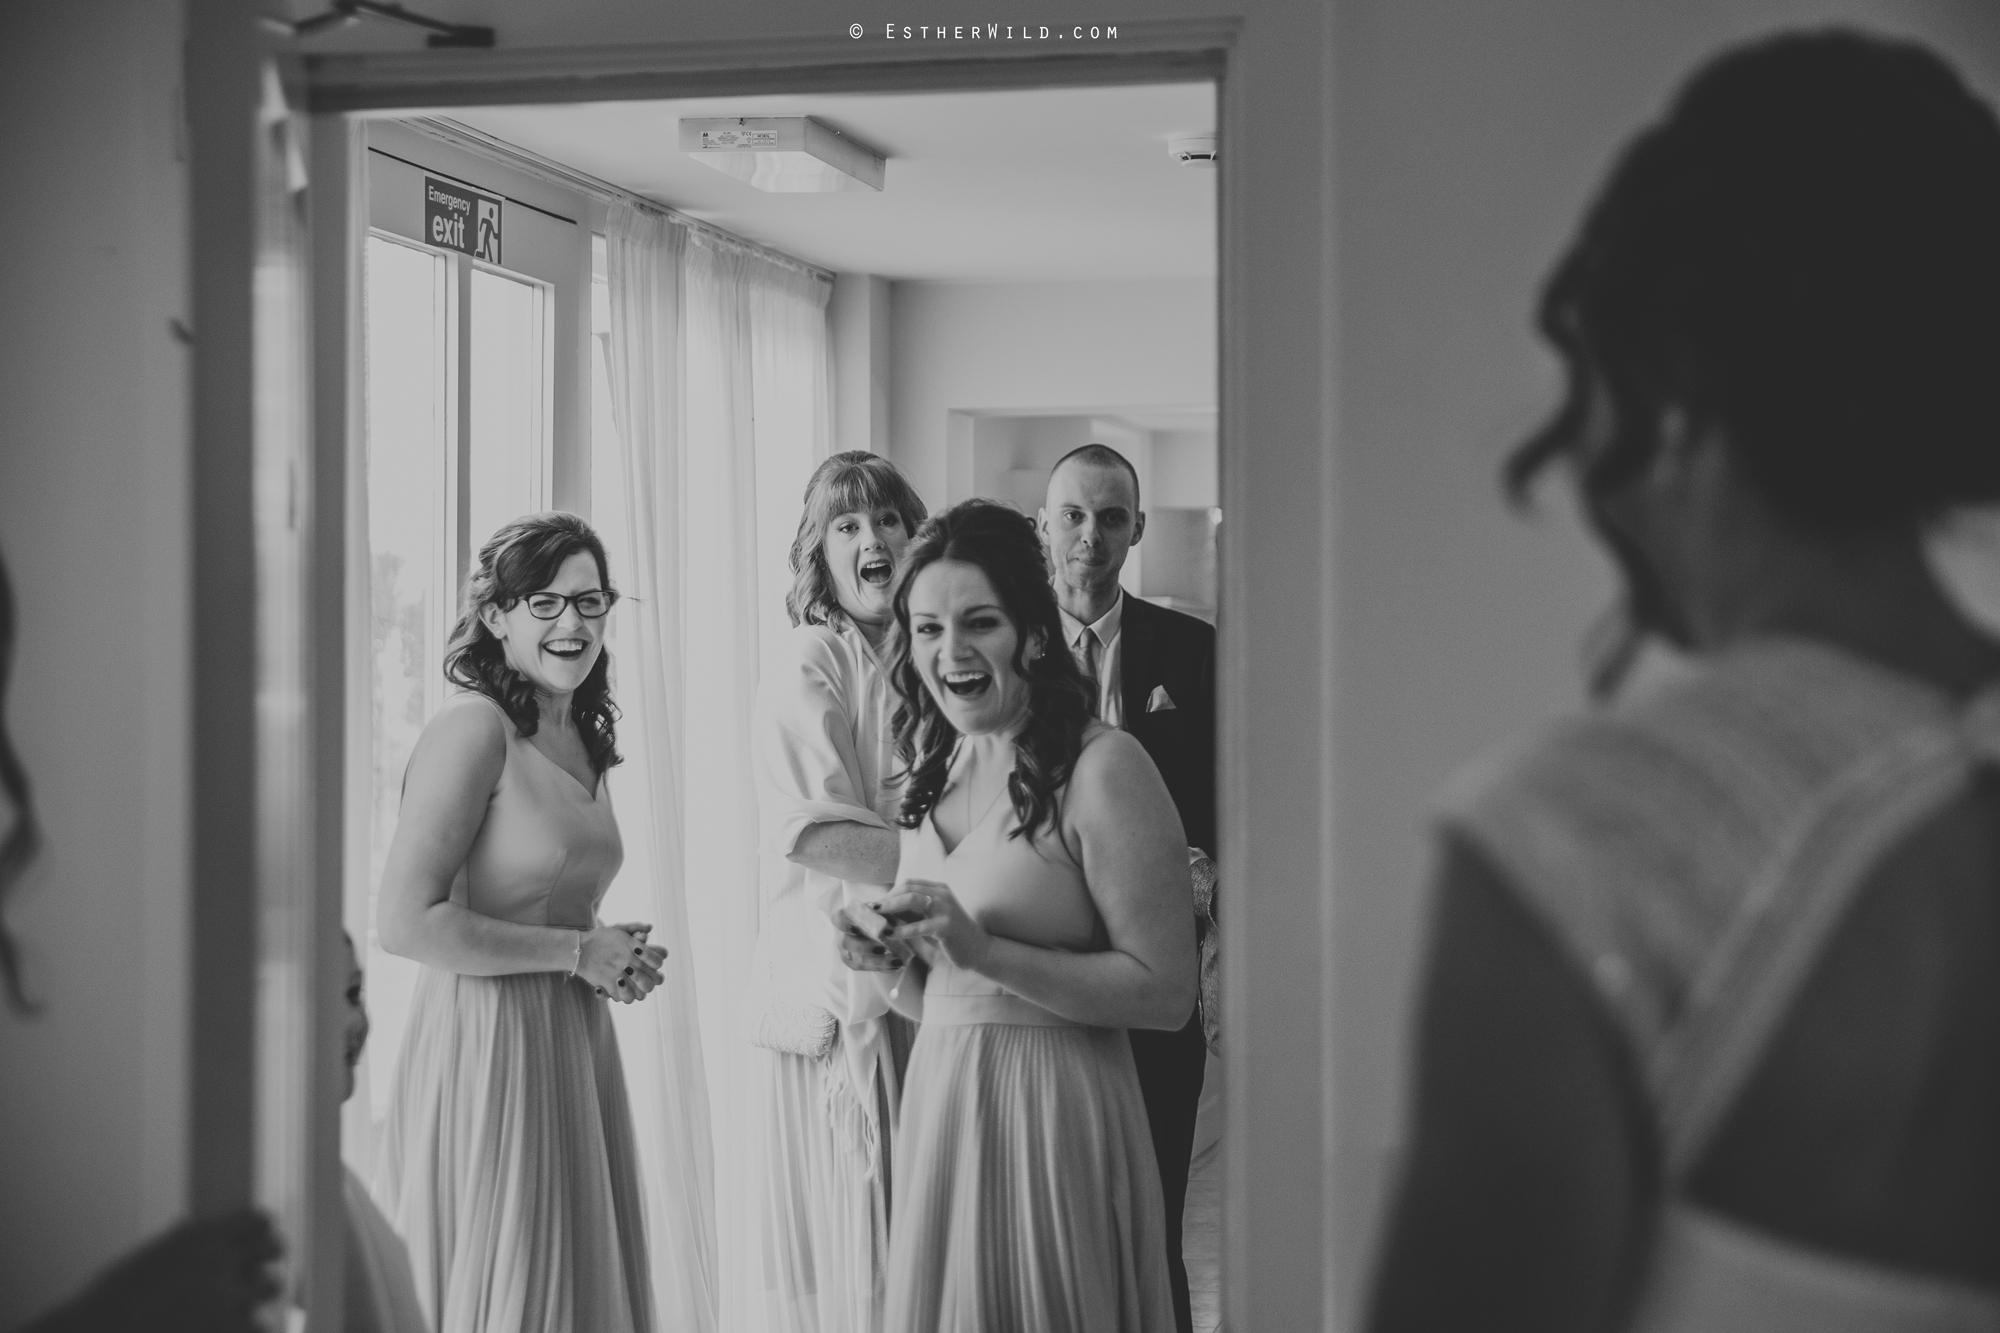 Elms_Barn_Weddings_Suffolk_Photographer_Copyright_Esther_Wild_IMG_0727-2.jpg